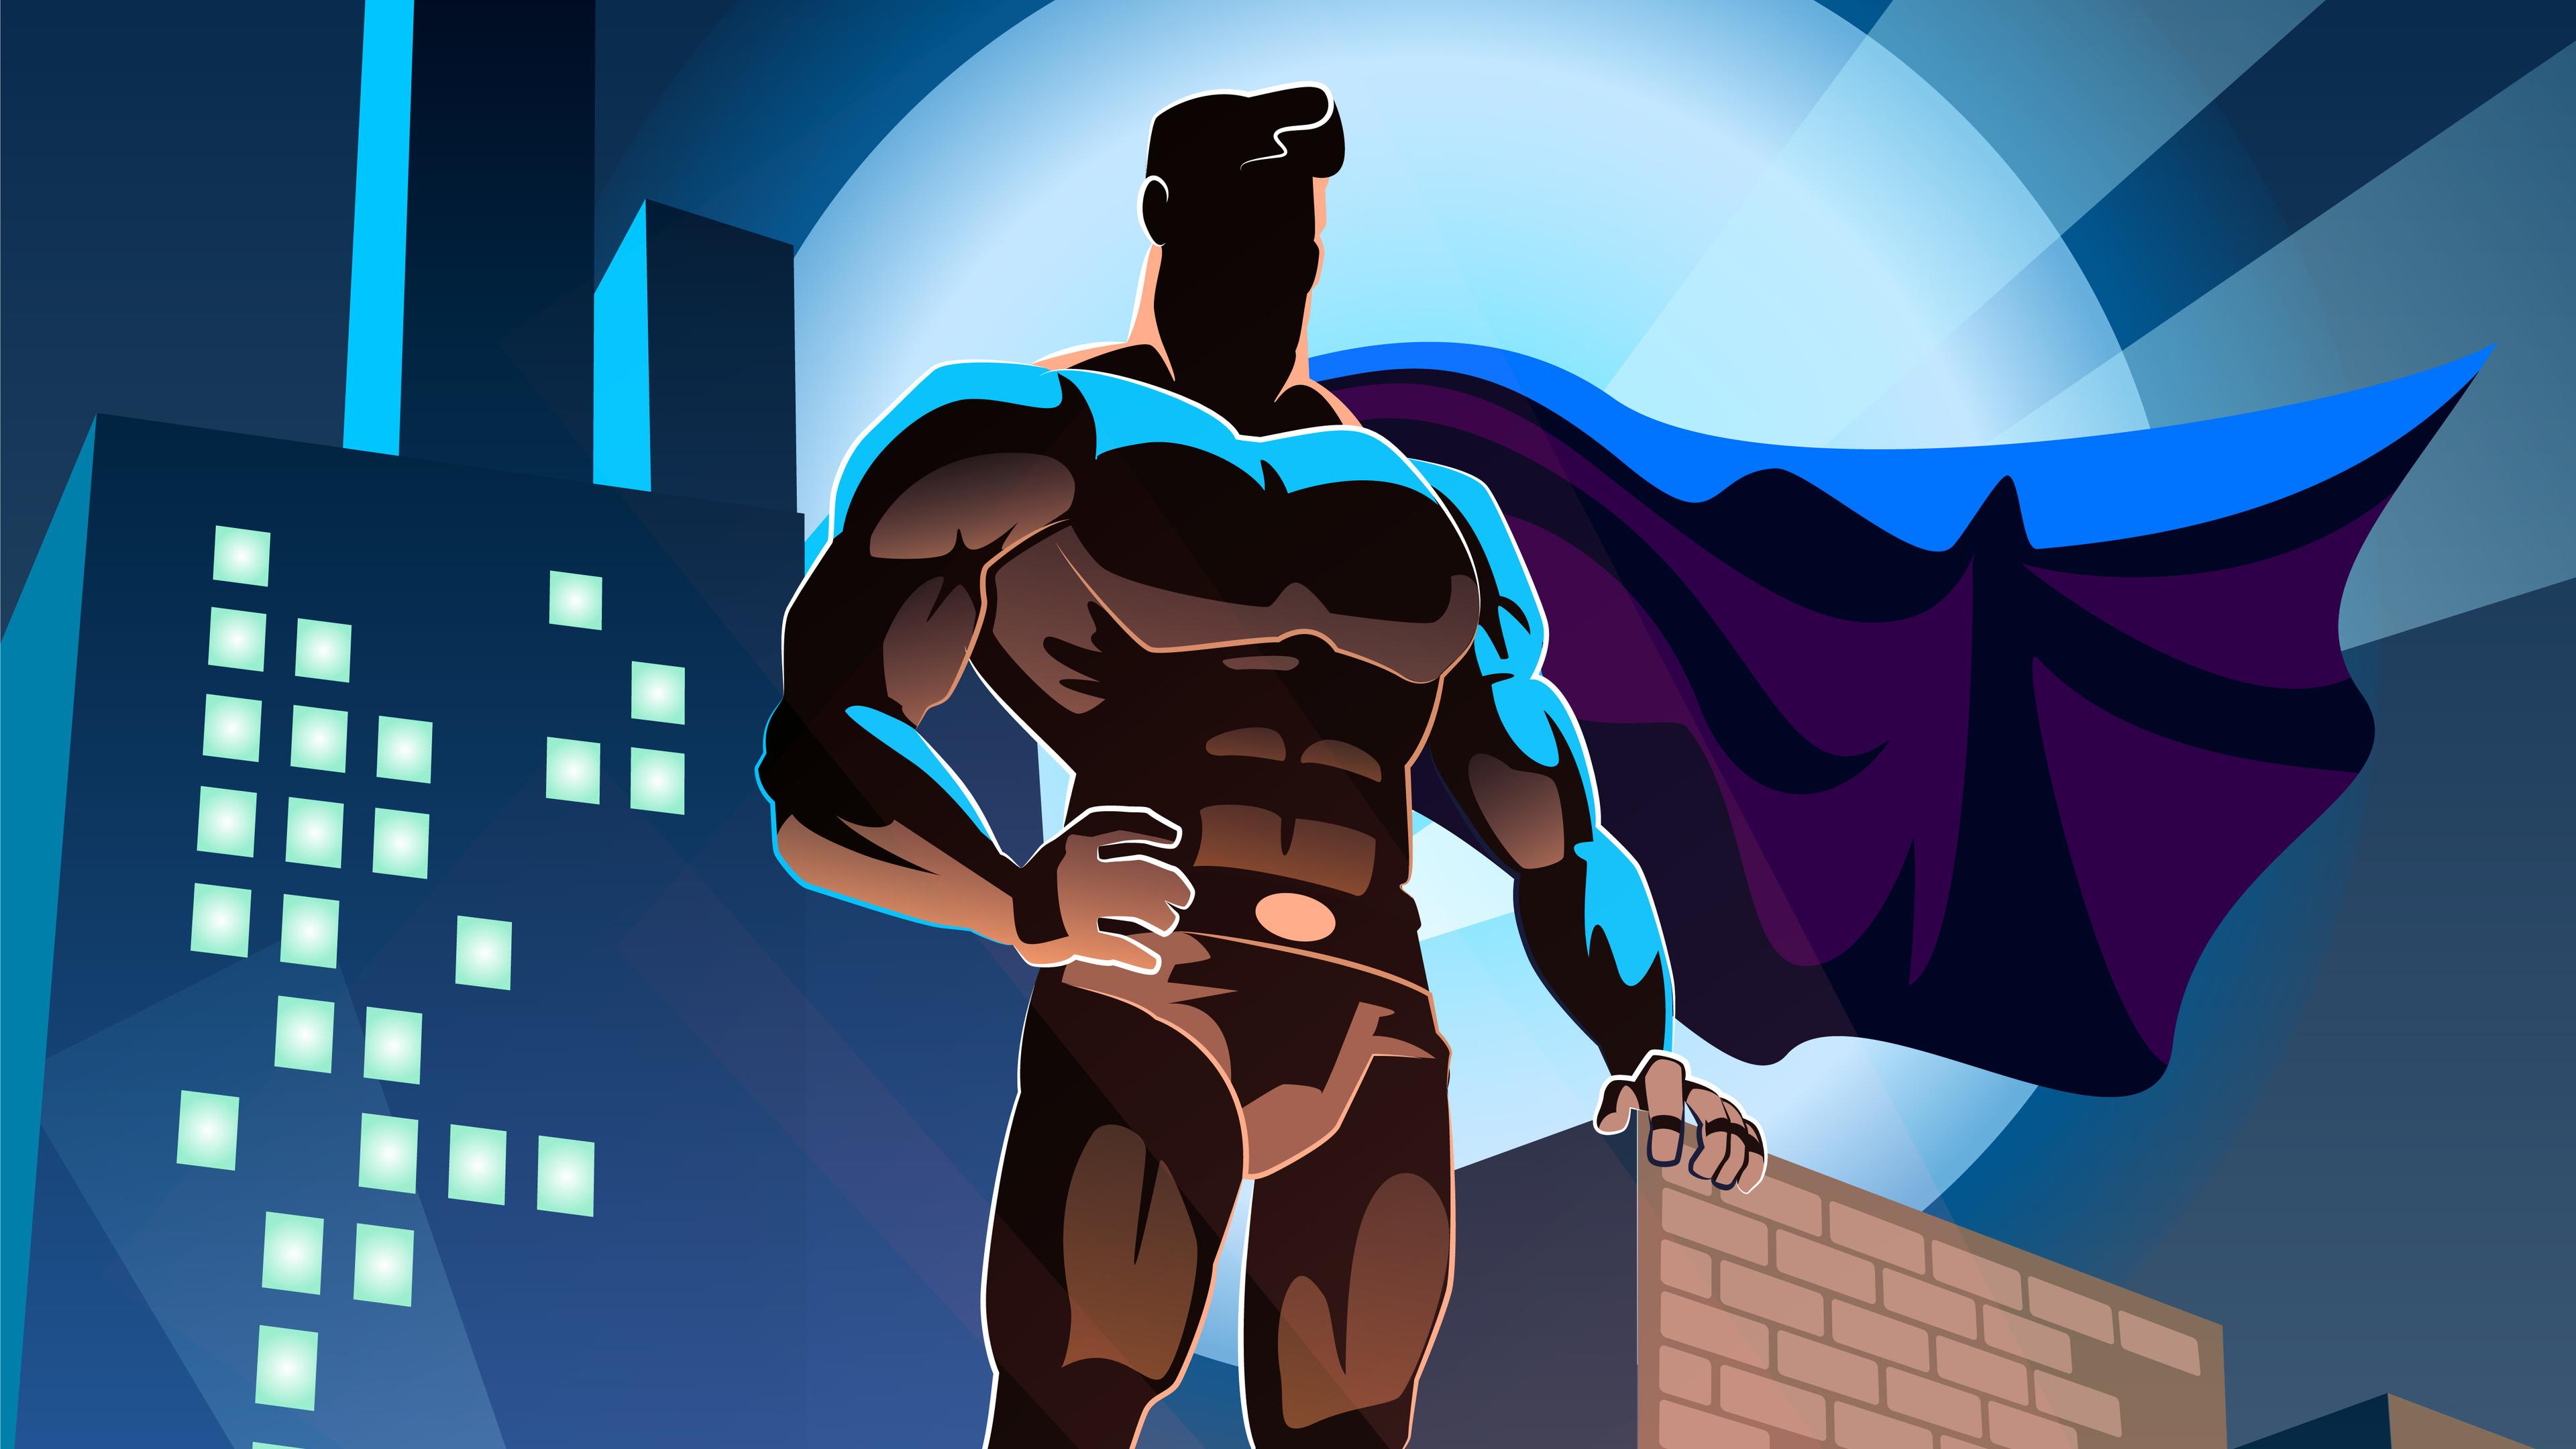 super hero 4k 1555206624 - Super Hero 4k - superheroes wallpapers, hd-wallpapers, artwork wallpapers, 5k wallpapers, 4k-wallpapers